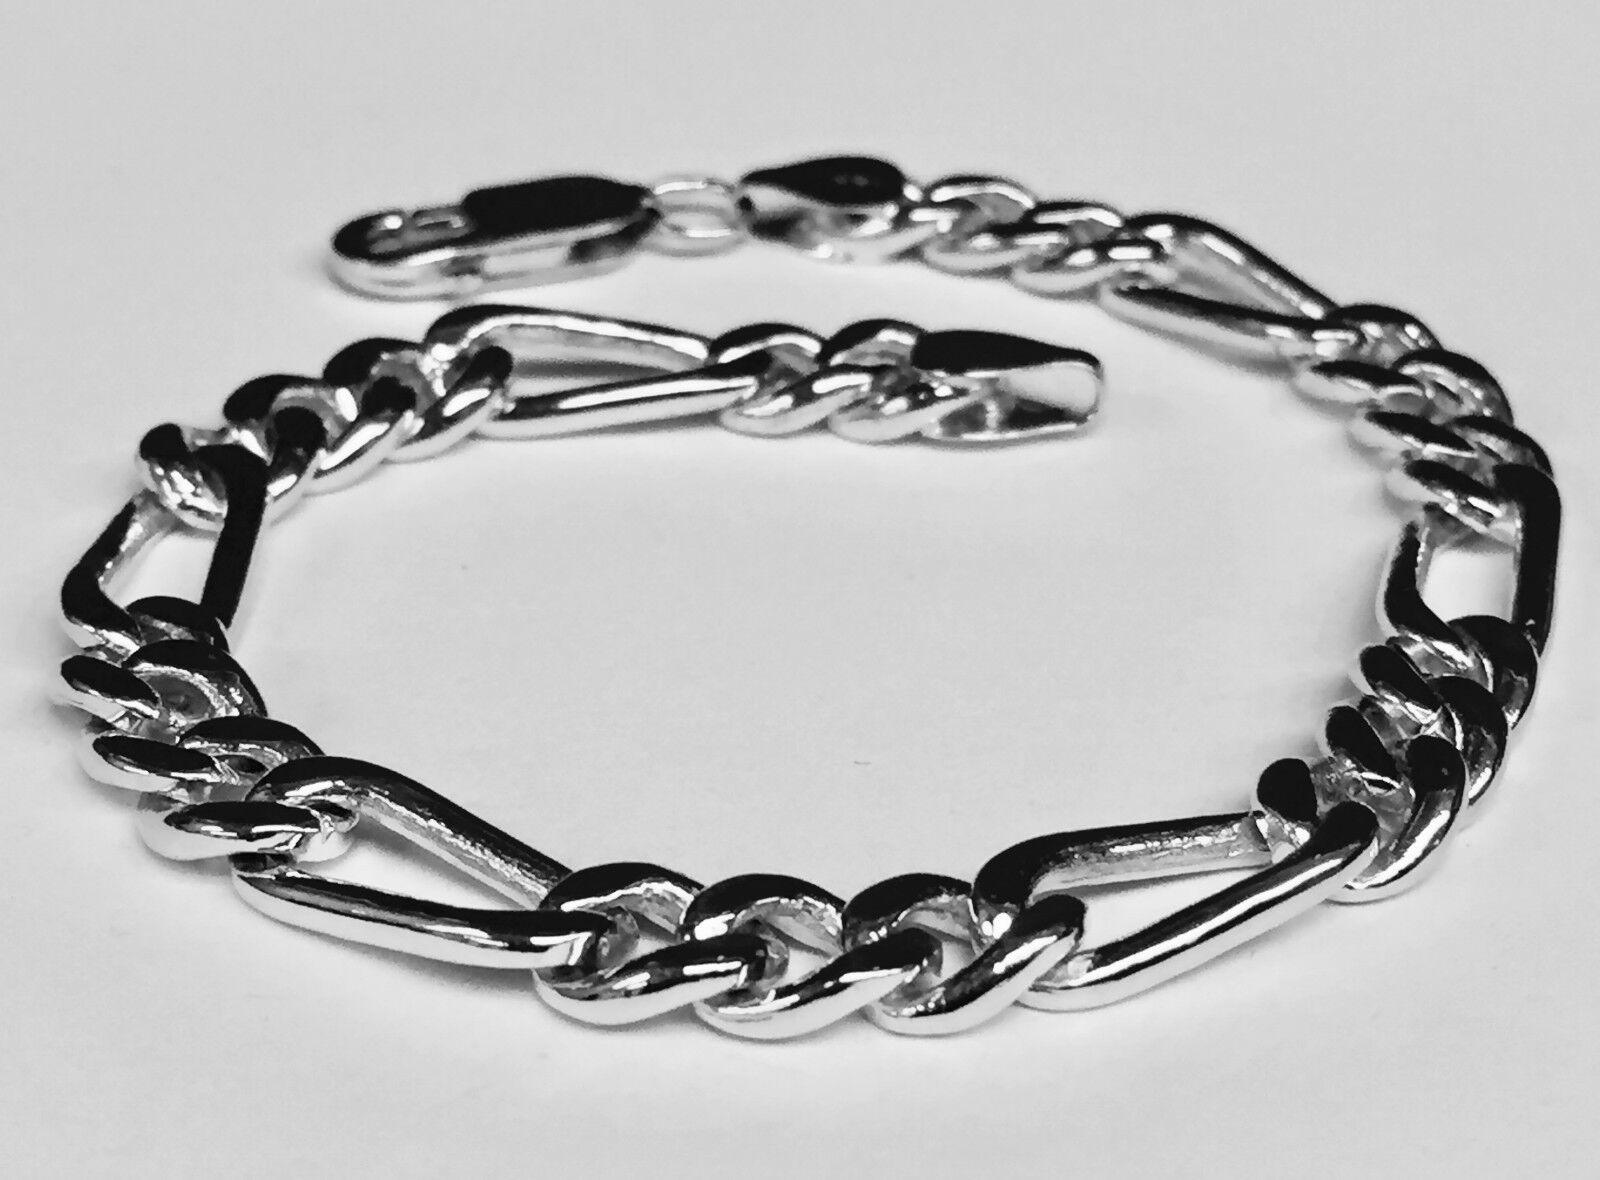 18k Solid White gold Figaro Curb link men's Chain Bracelet 9  29 Grams 7 MM